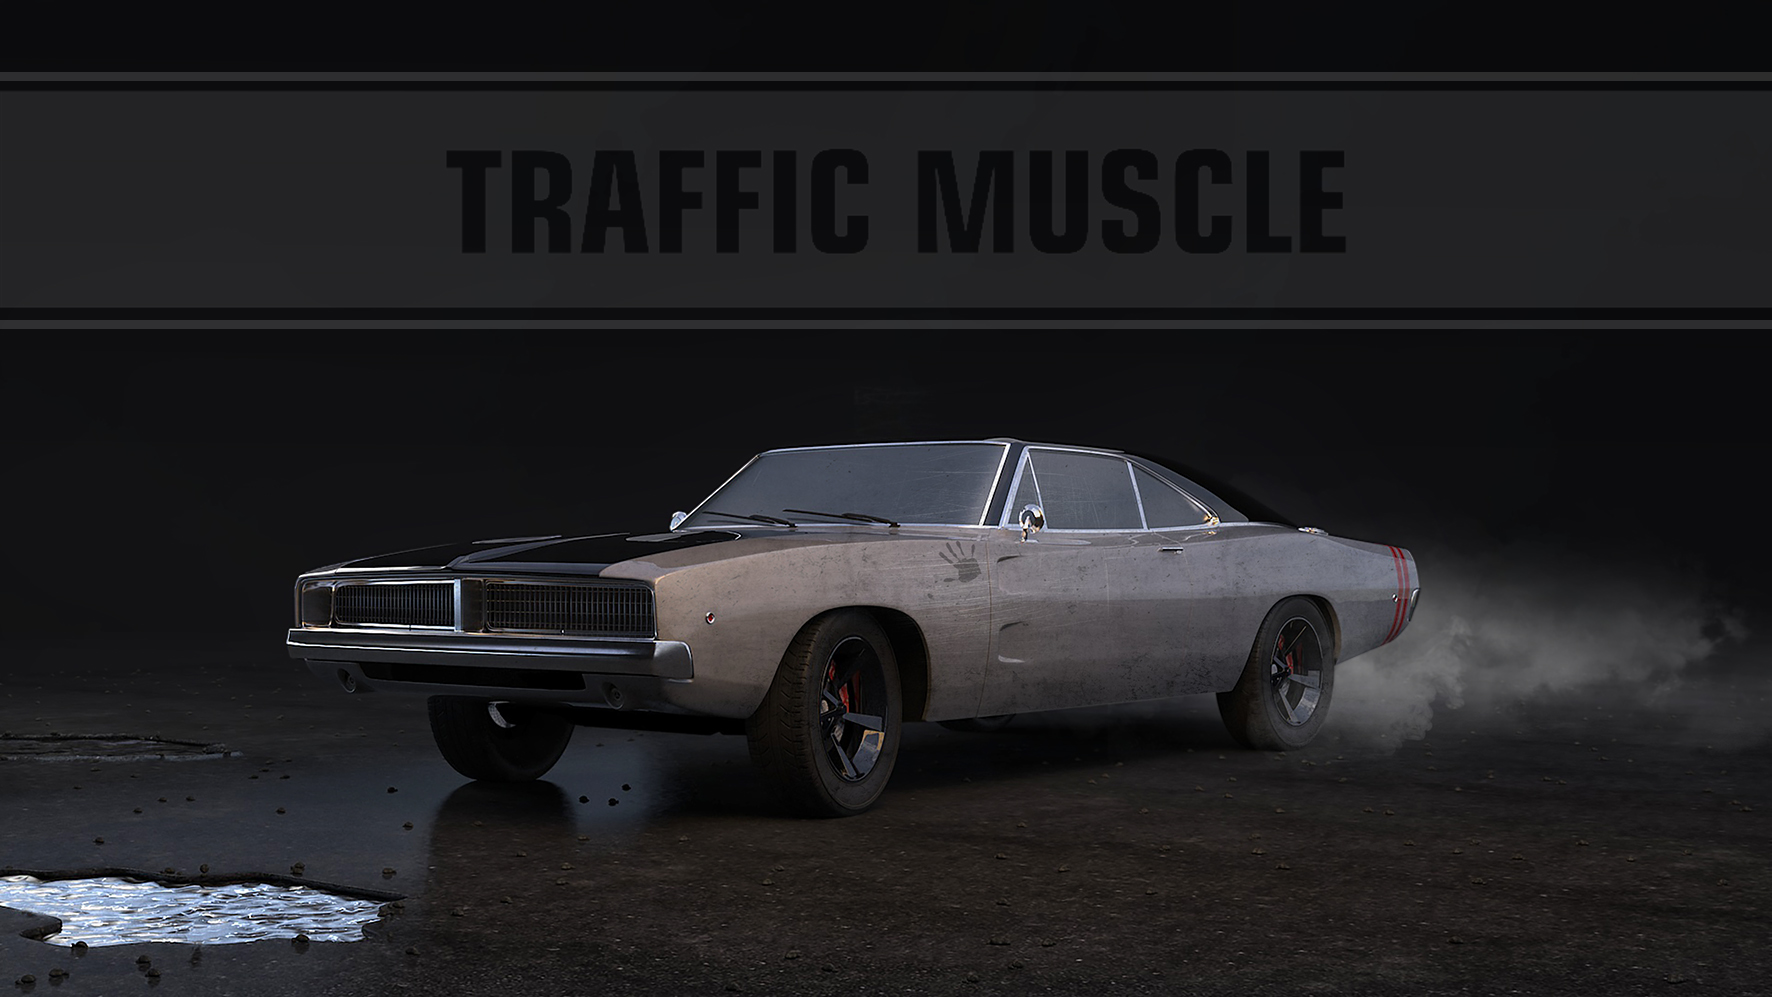 Muscle Traffic